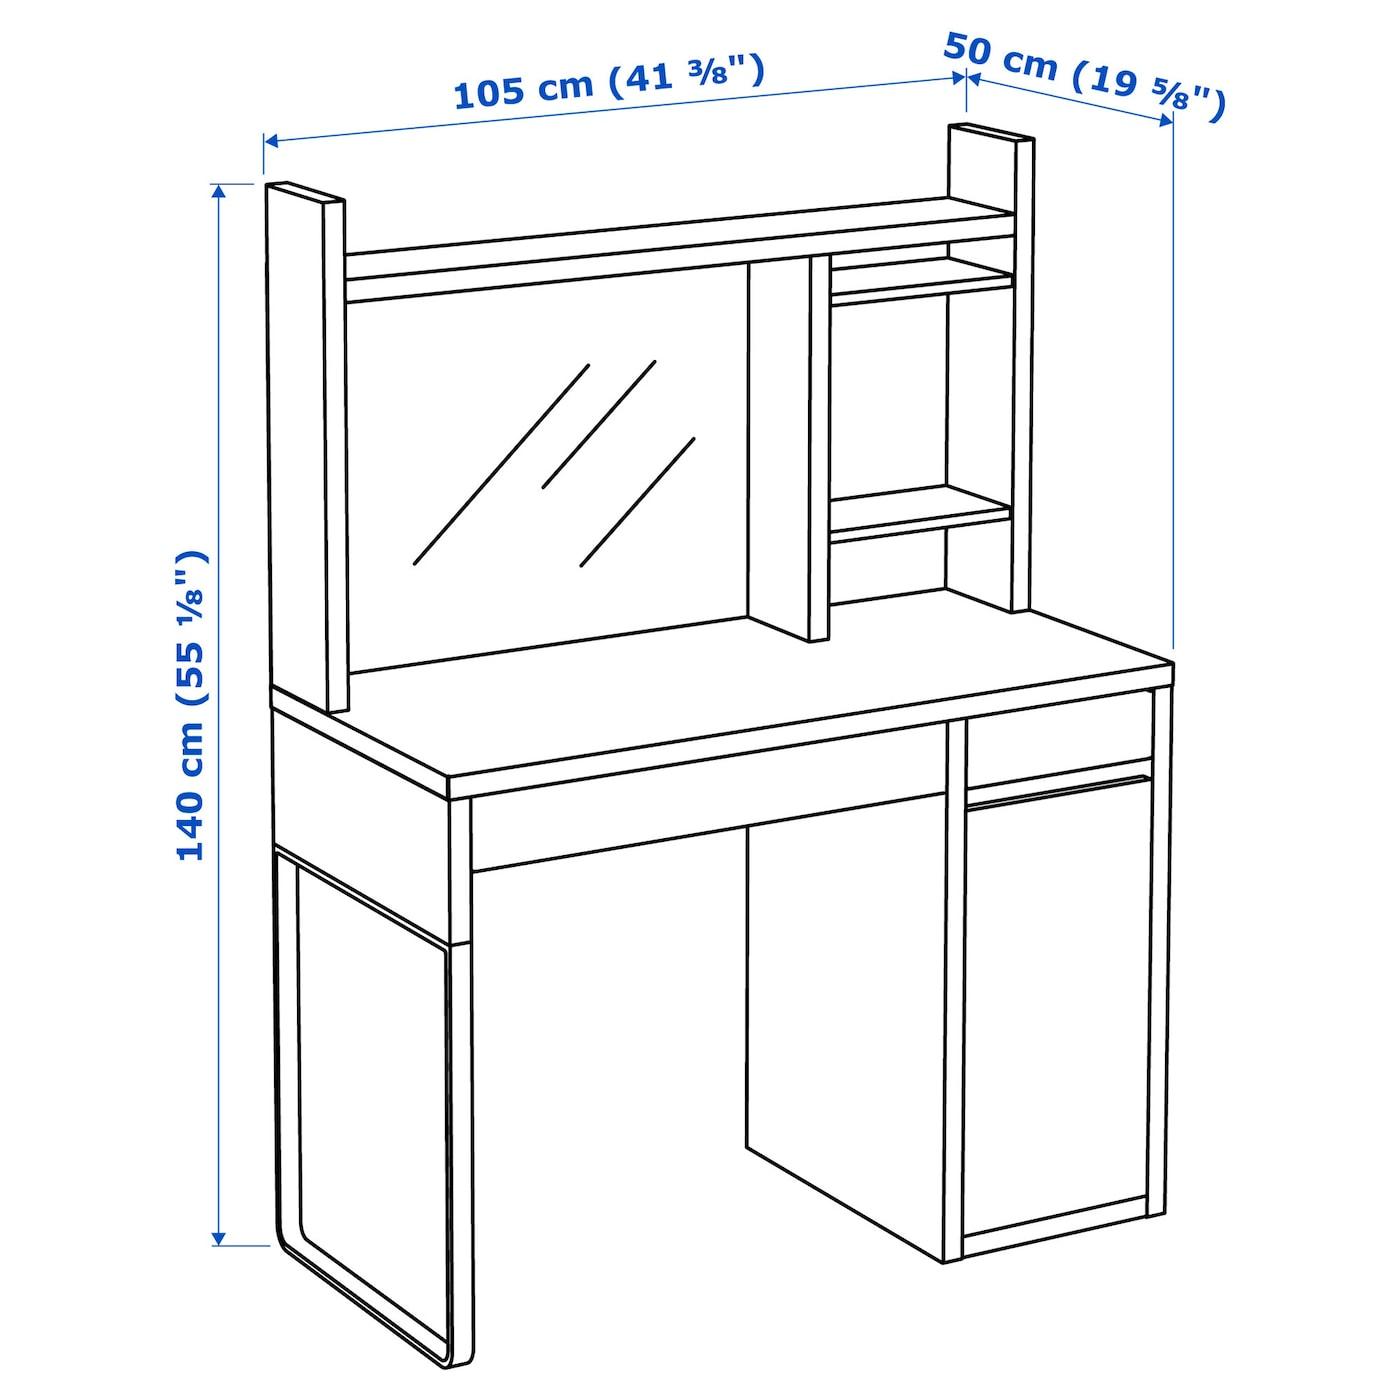 micke poste de travail blanc 105 x 50 cm ikea. Black Bedroom Furniture Sets. Home Design Ideas